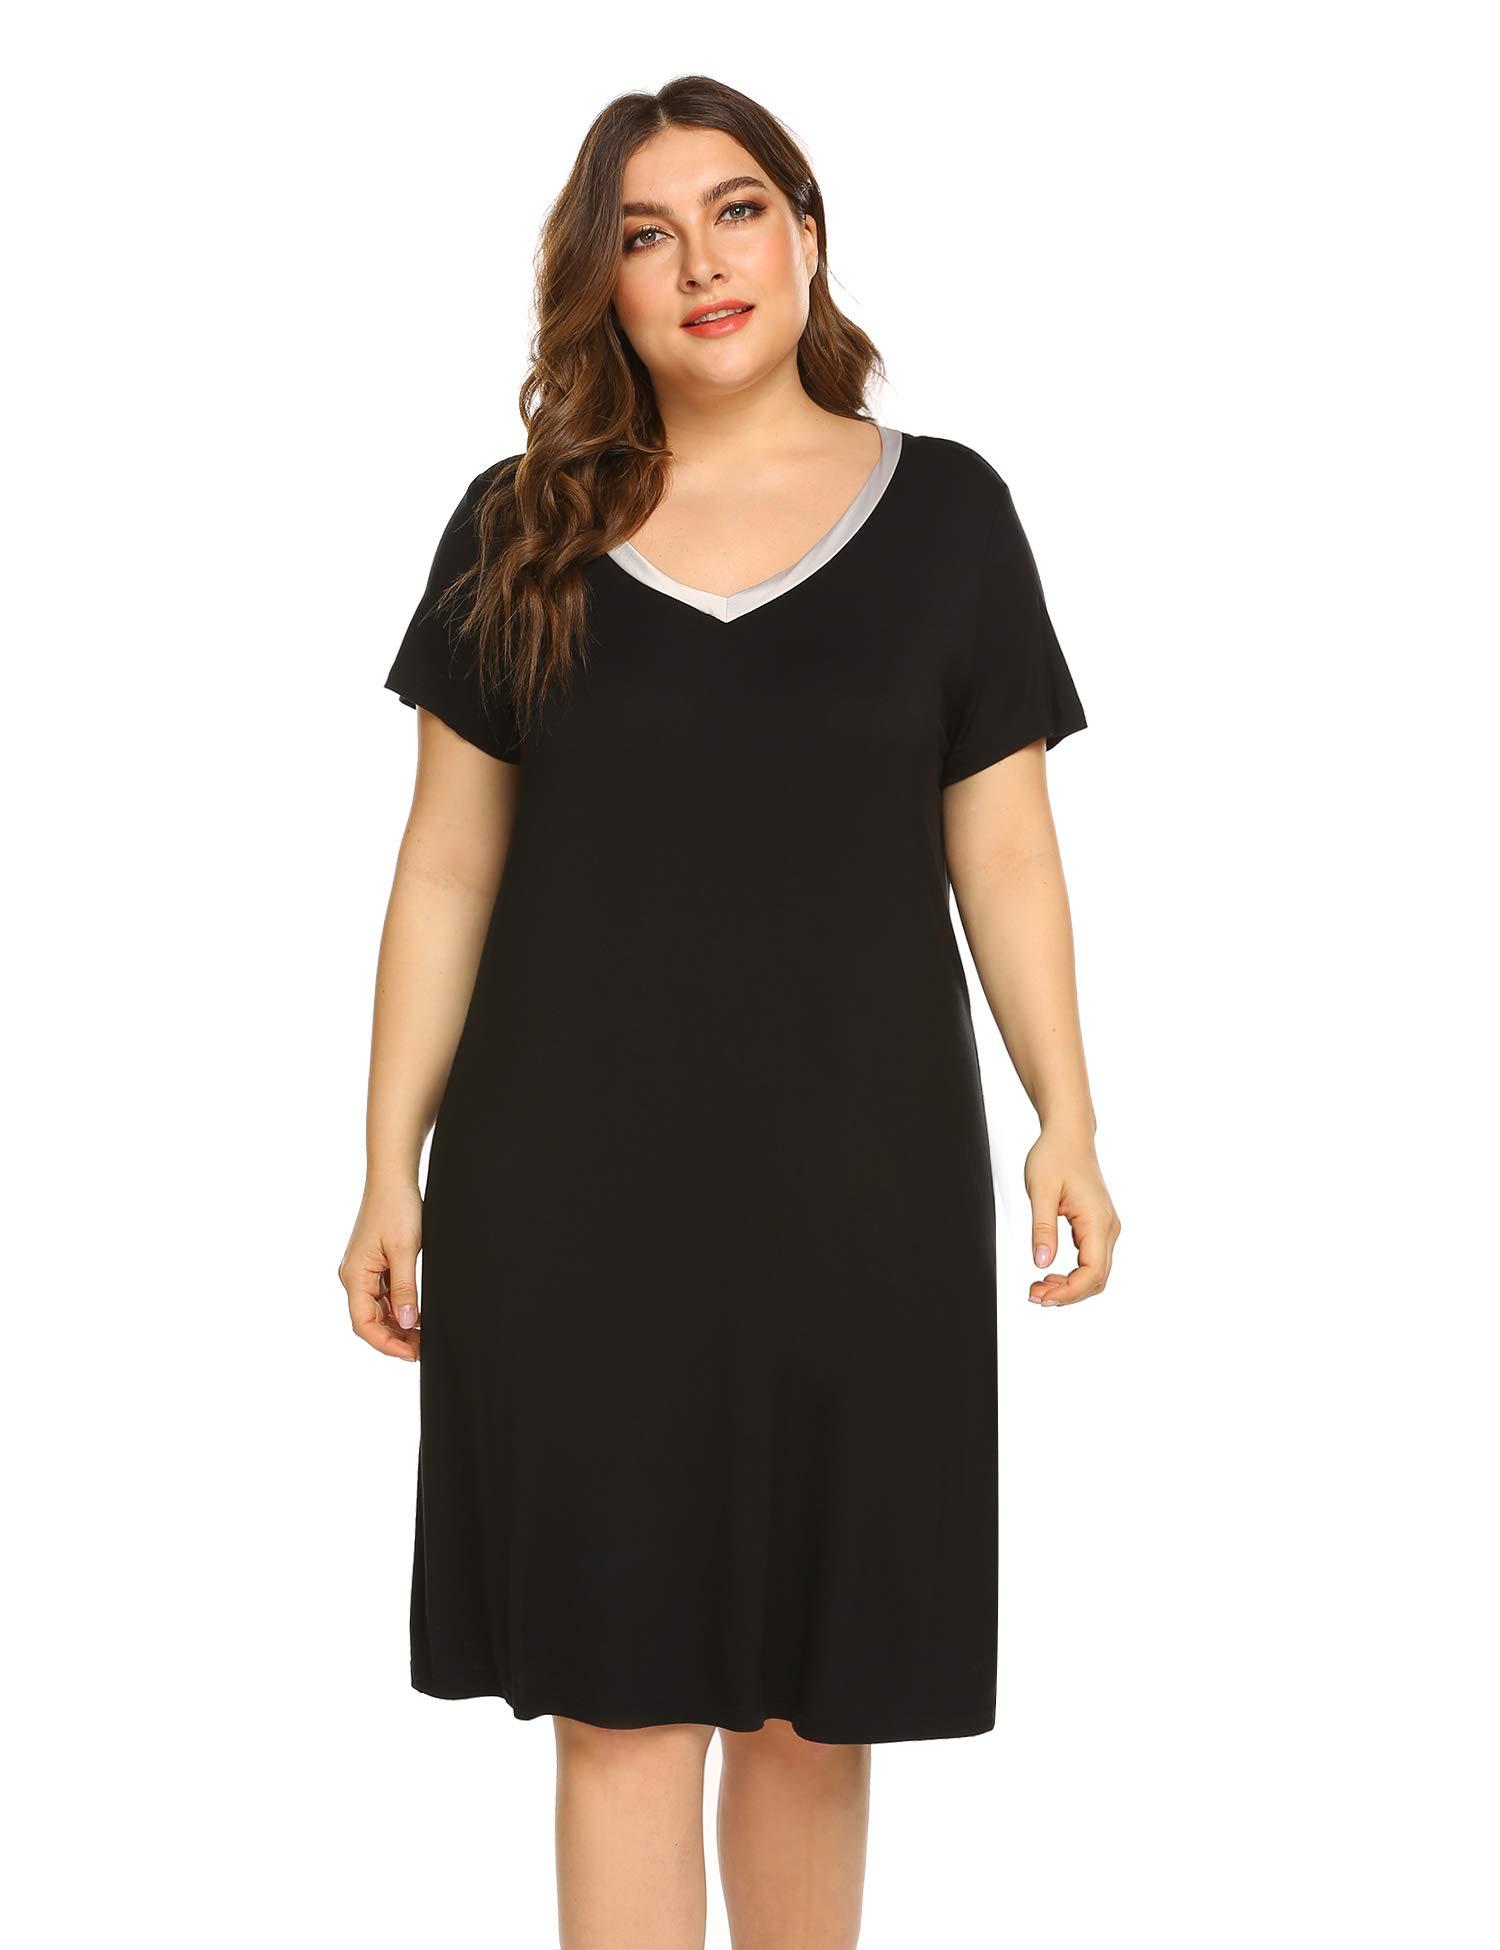 IN'VOLAND Plus Size Nightgowns Women V Neck Sleep Shirt Short Sleeve Nightdress Pajama Sleepwear Black